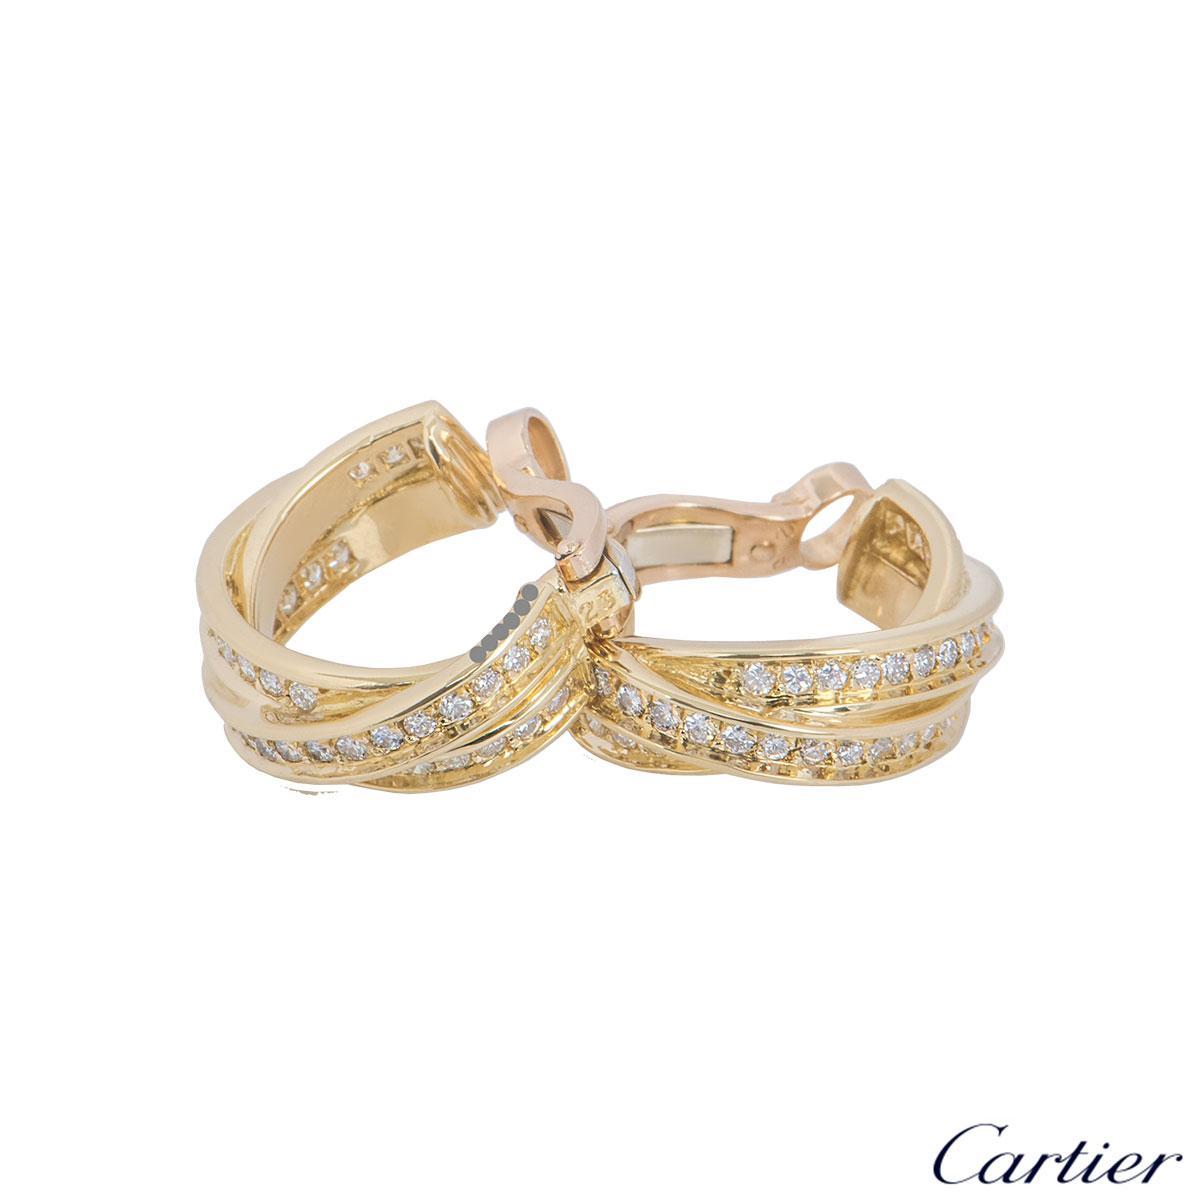 Cartier Yellow Gold Diamond Trinity De Cartier Earrings